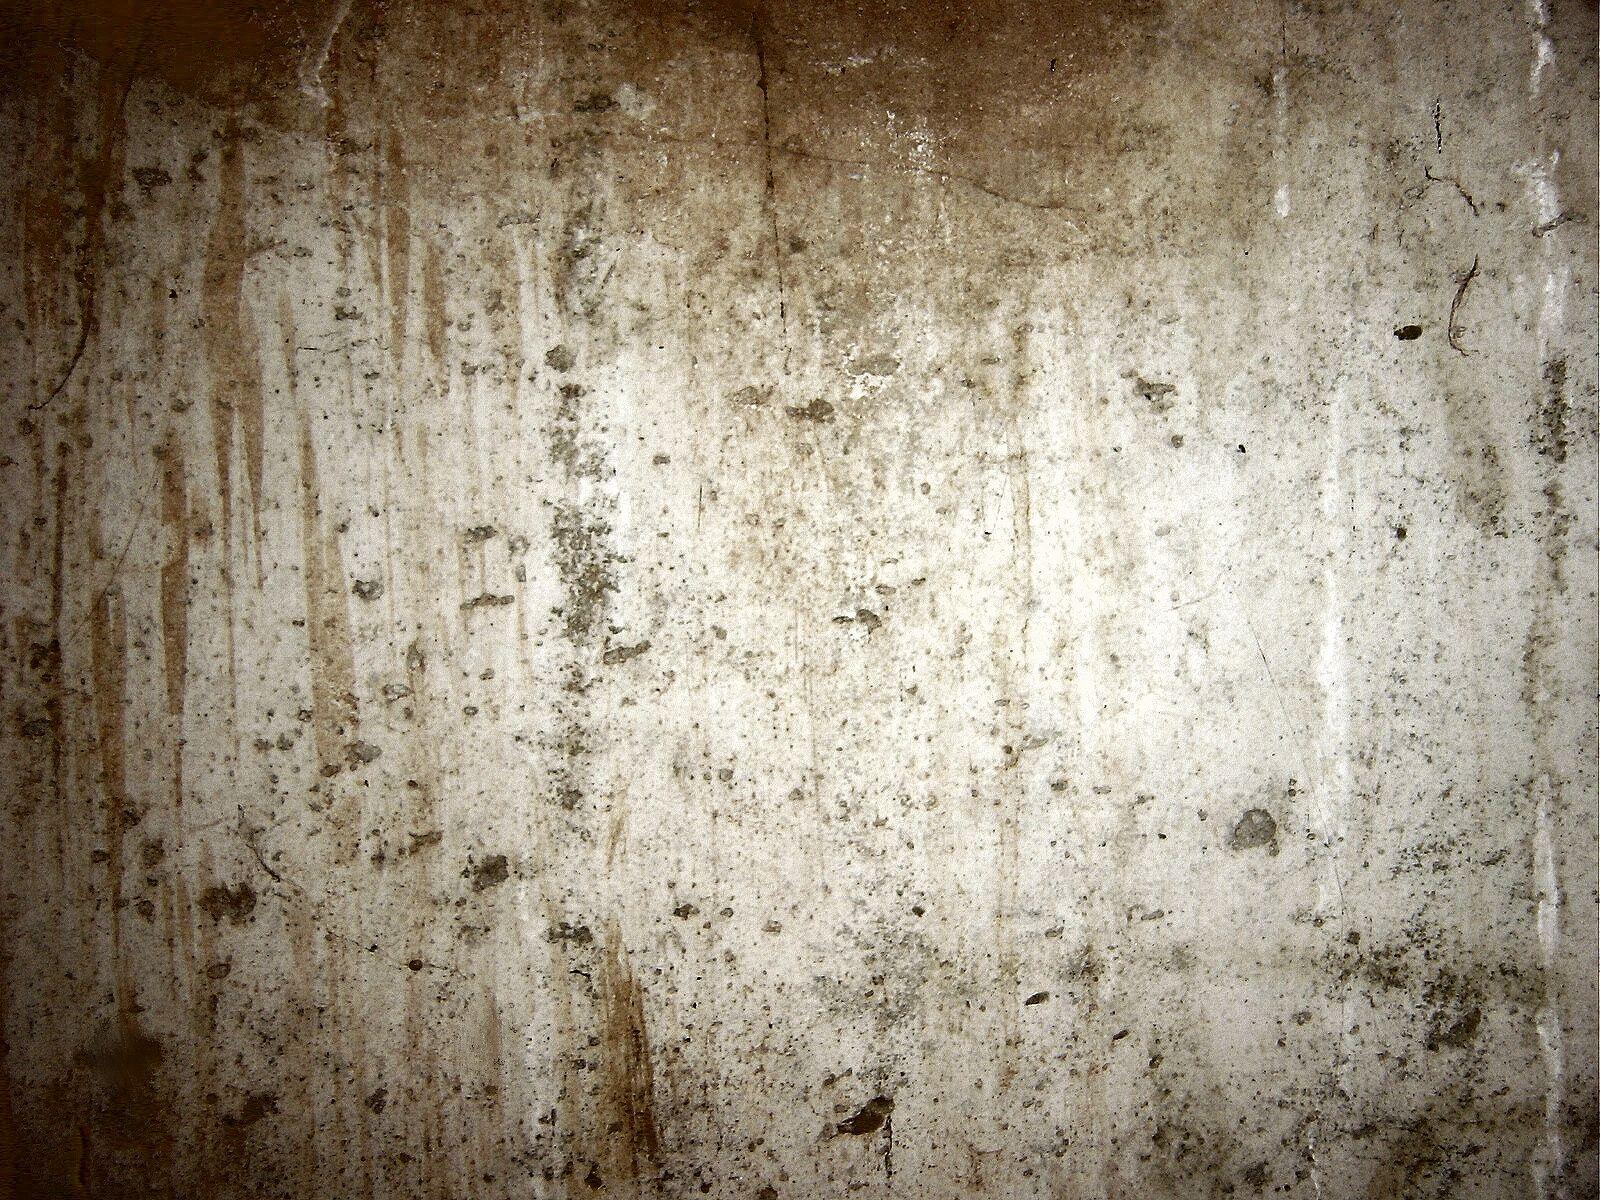 Charming Concrete Basement Wall Texture By FantasyStock.deviantart.com On @deviantART Amazing Ideas